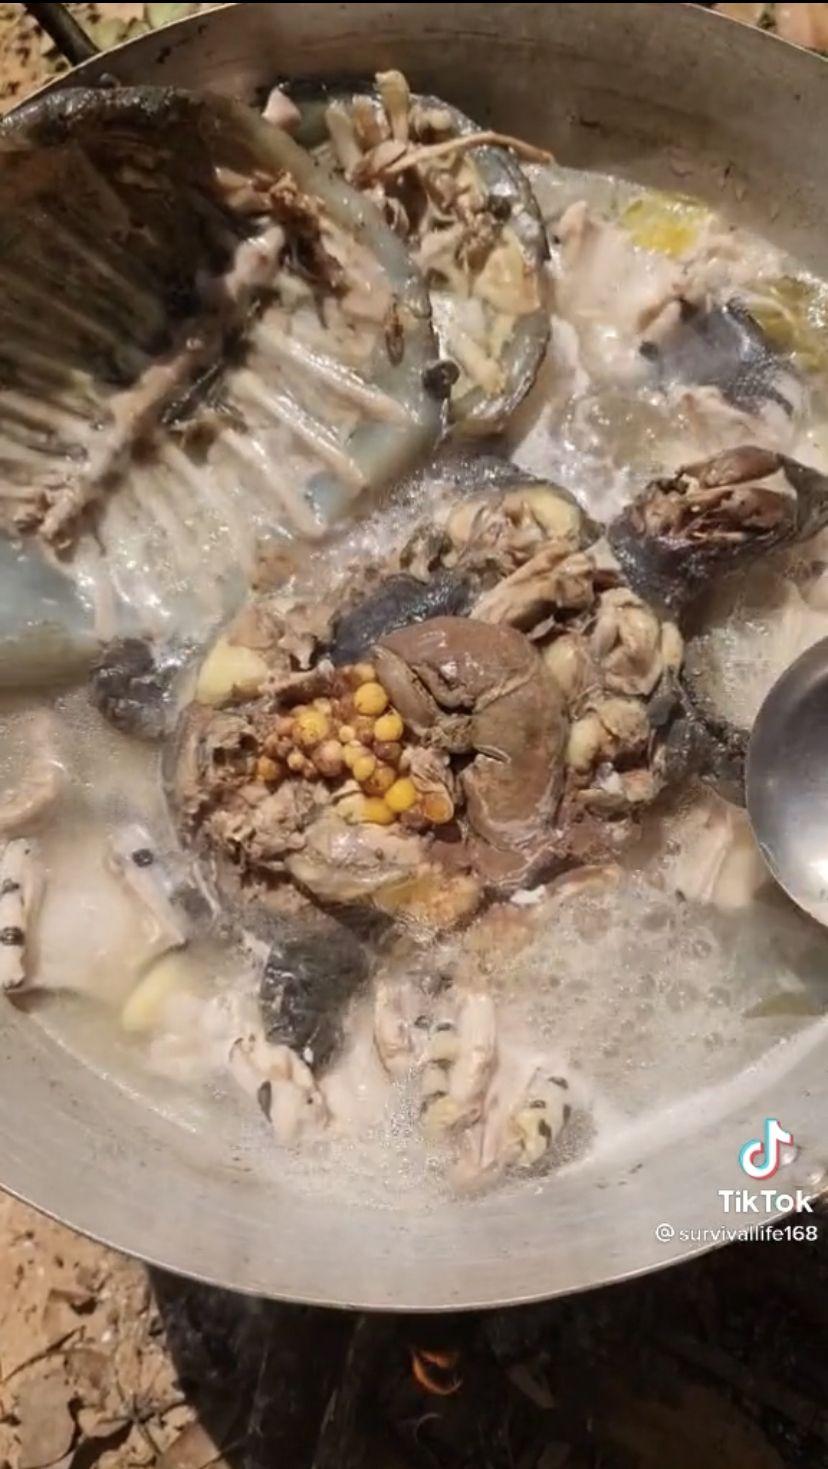 Video Masak Sup Daging Ular dan Kura-kura Ini Sukses Bikin Netizen Mual